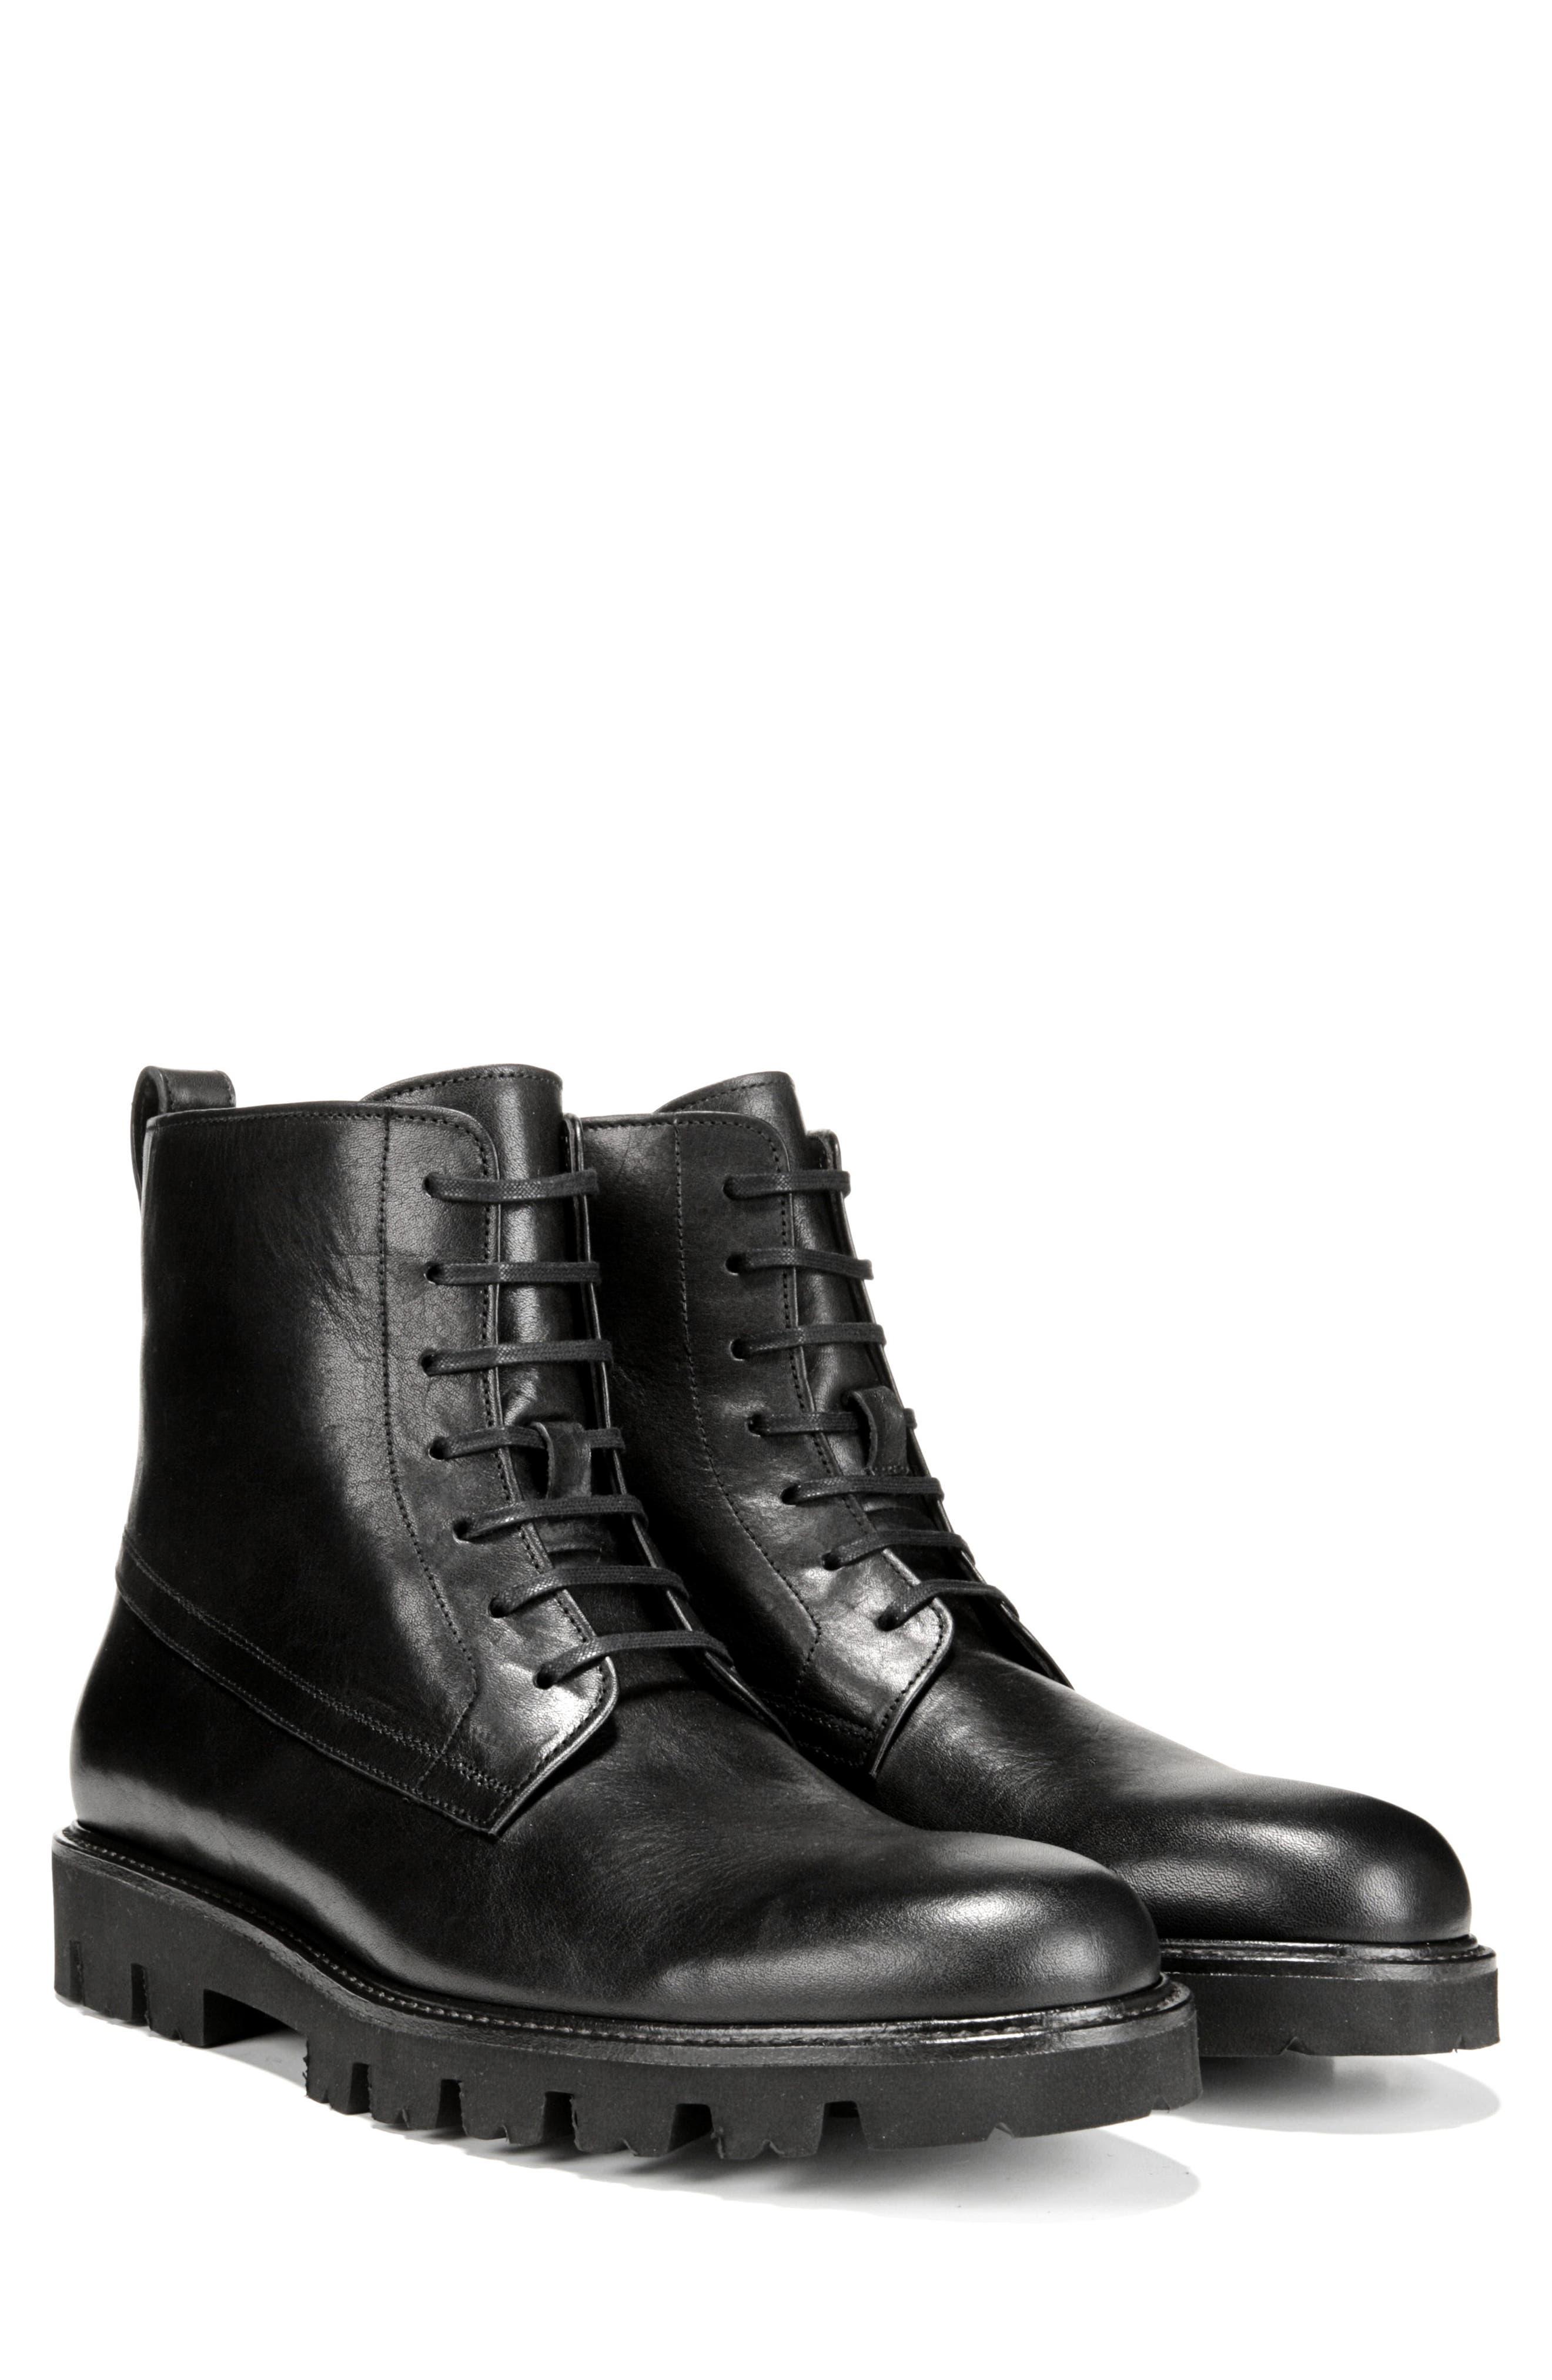 Commander Plain Toe Boot,                             Alternate thumbnail 9, color,                             001